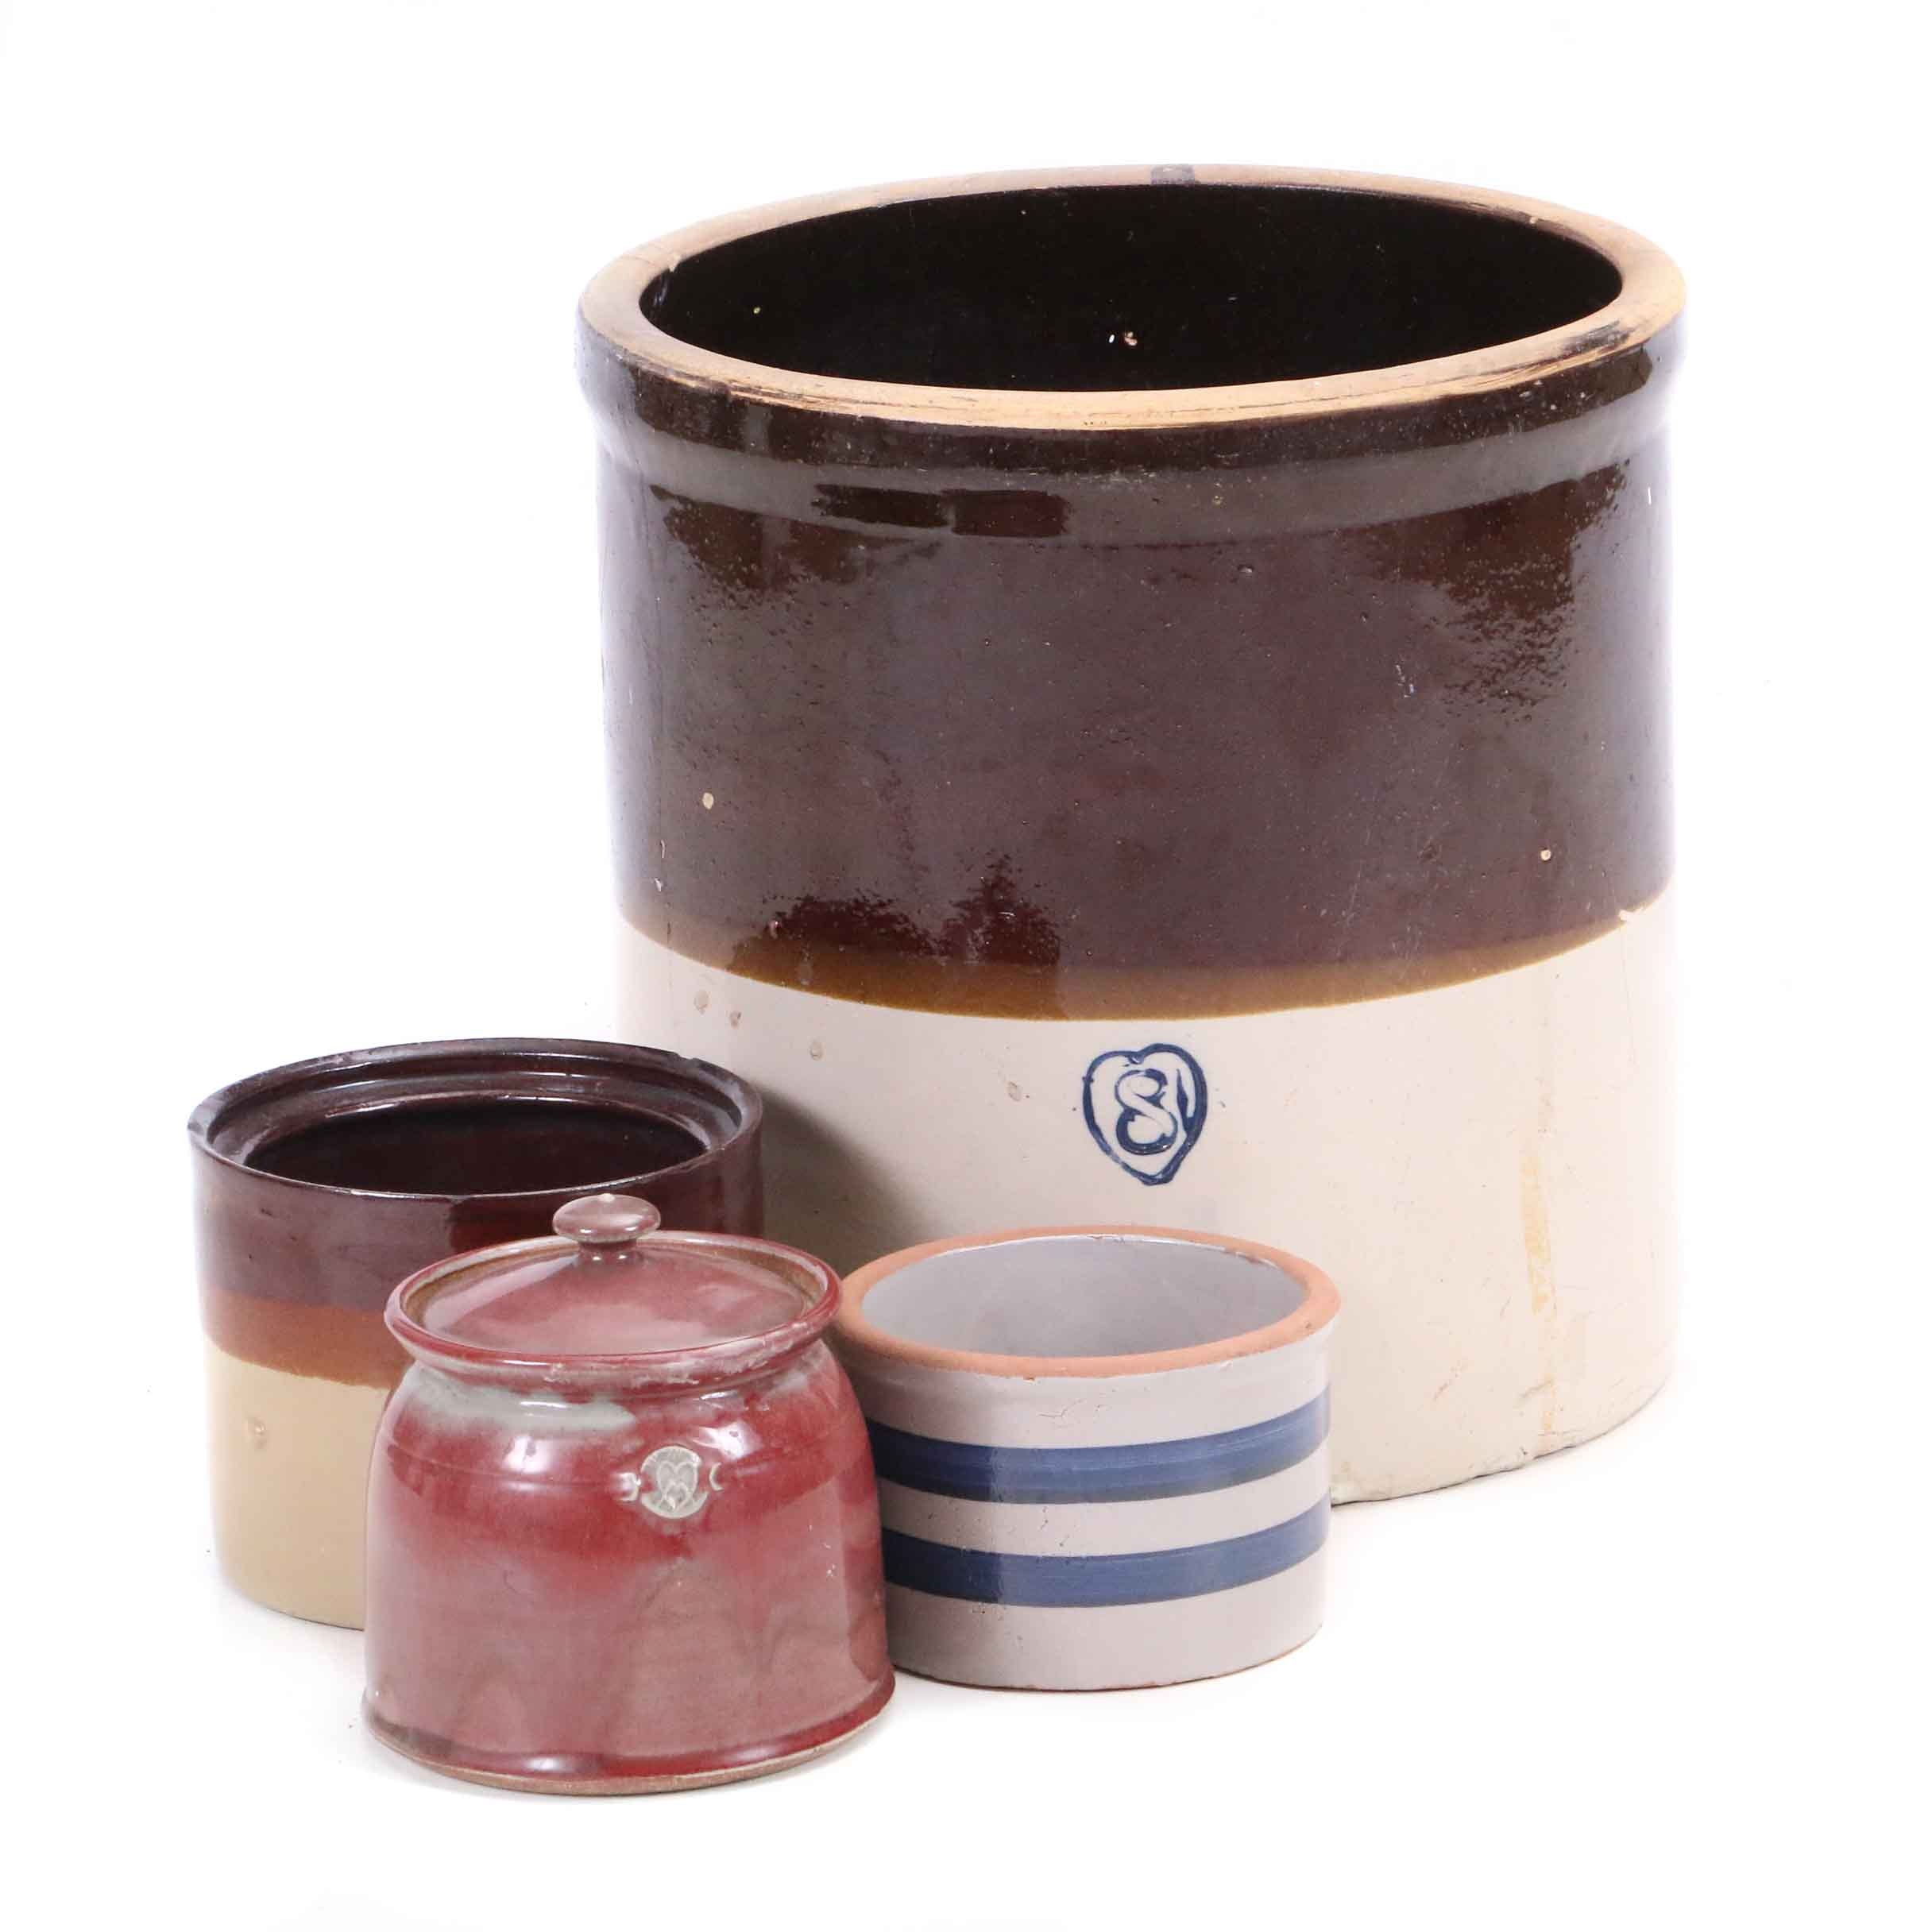 Stoneware Crocks with Lidded Stoneware Jar